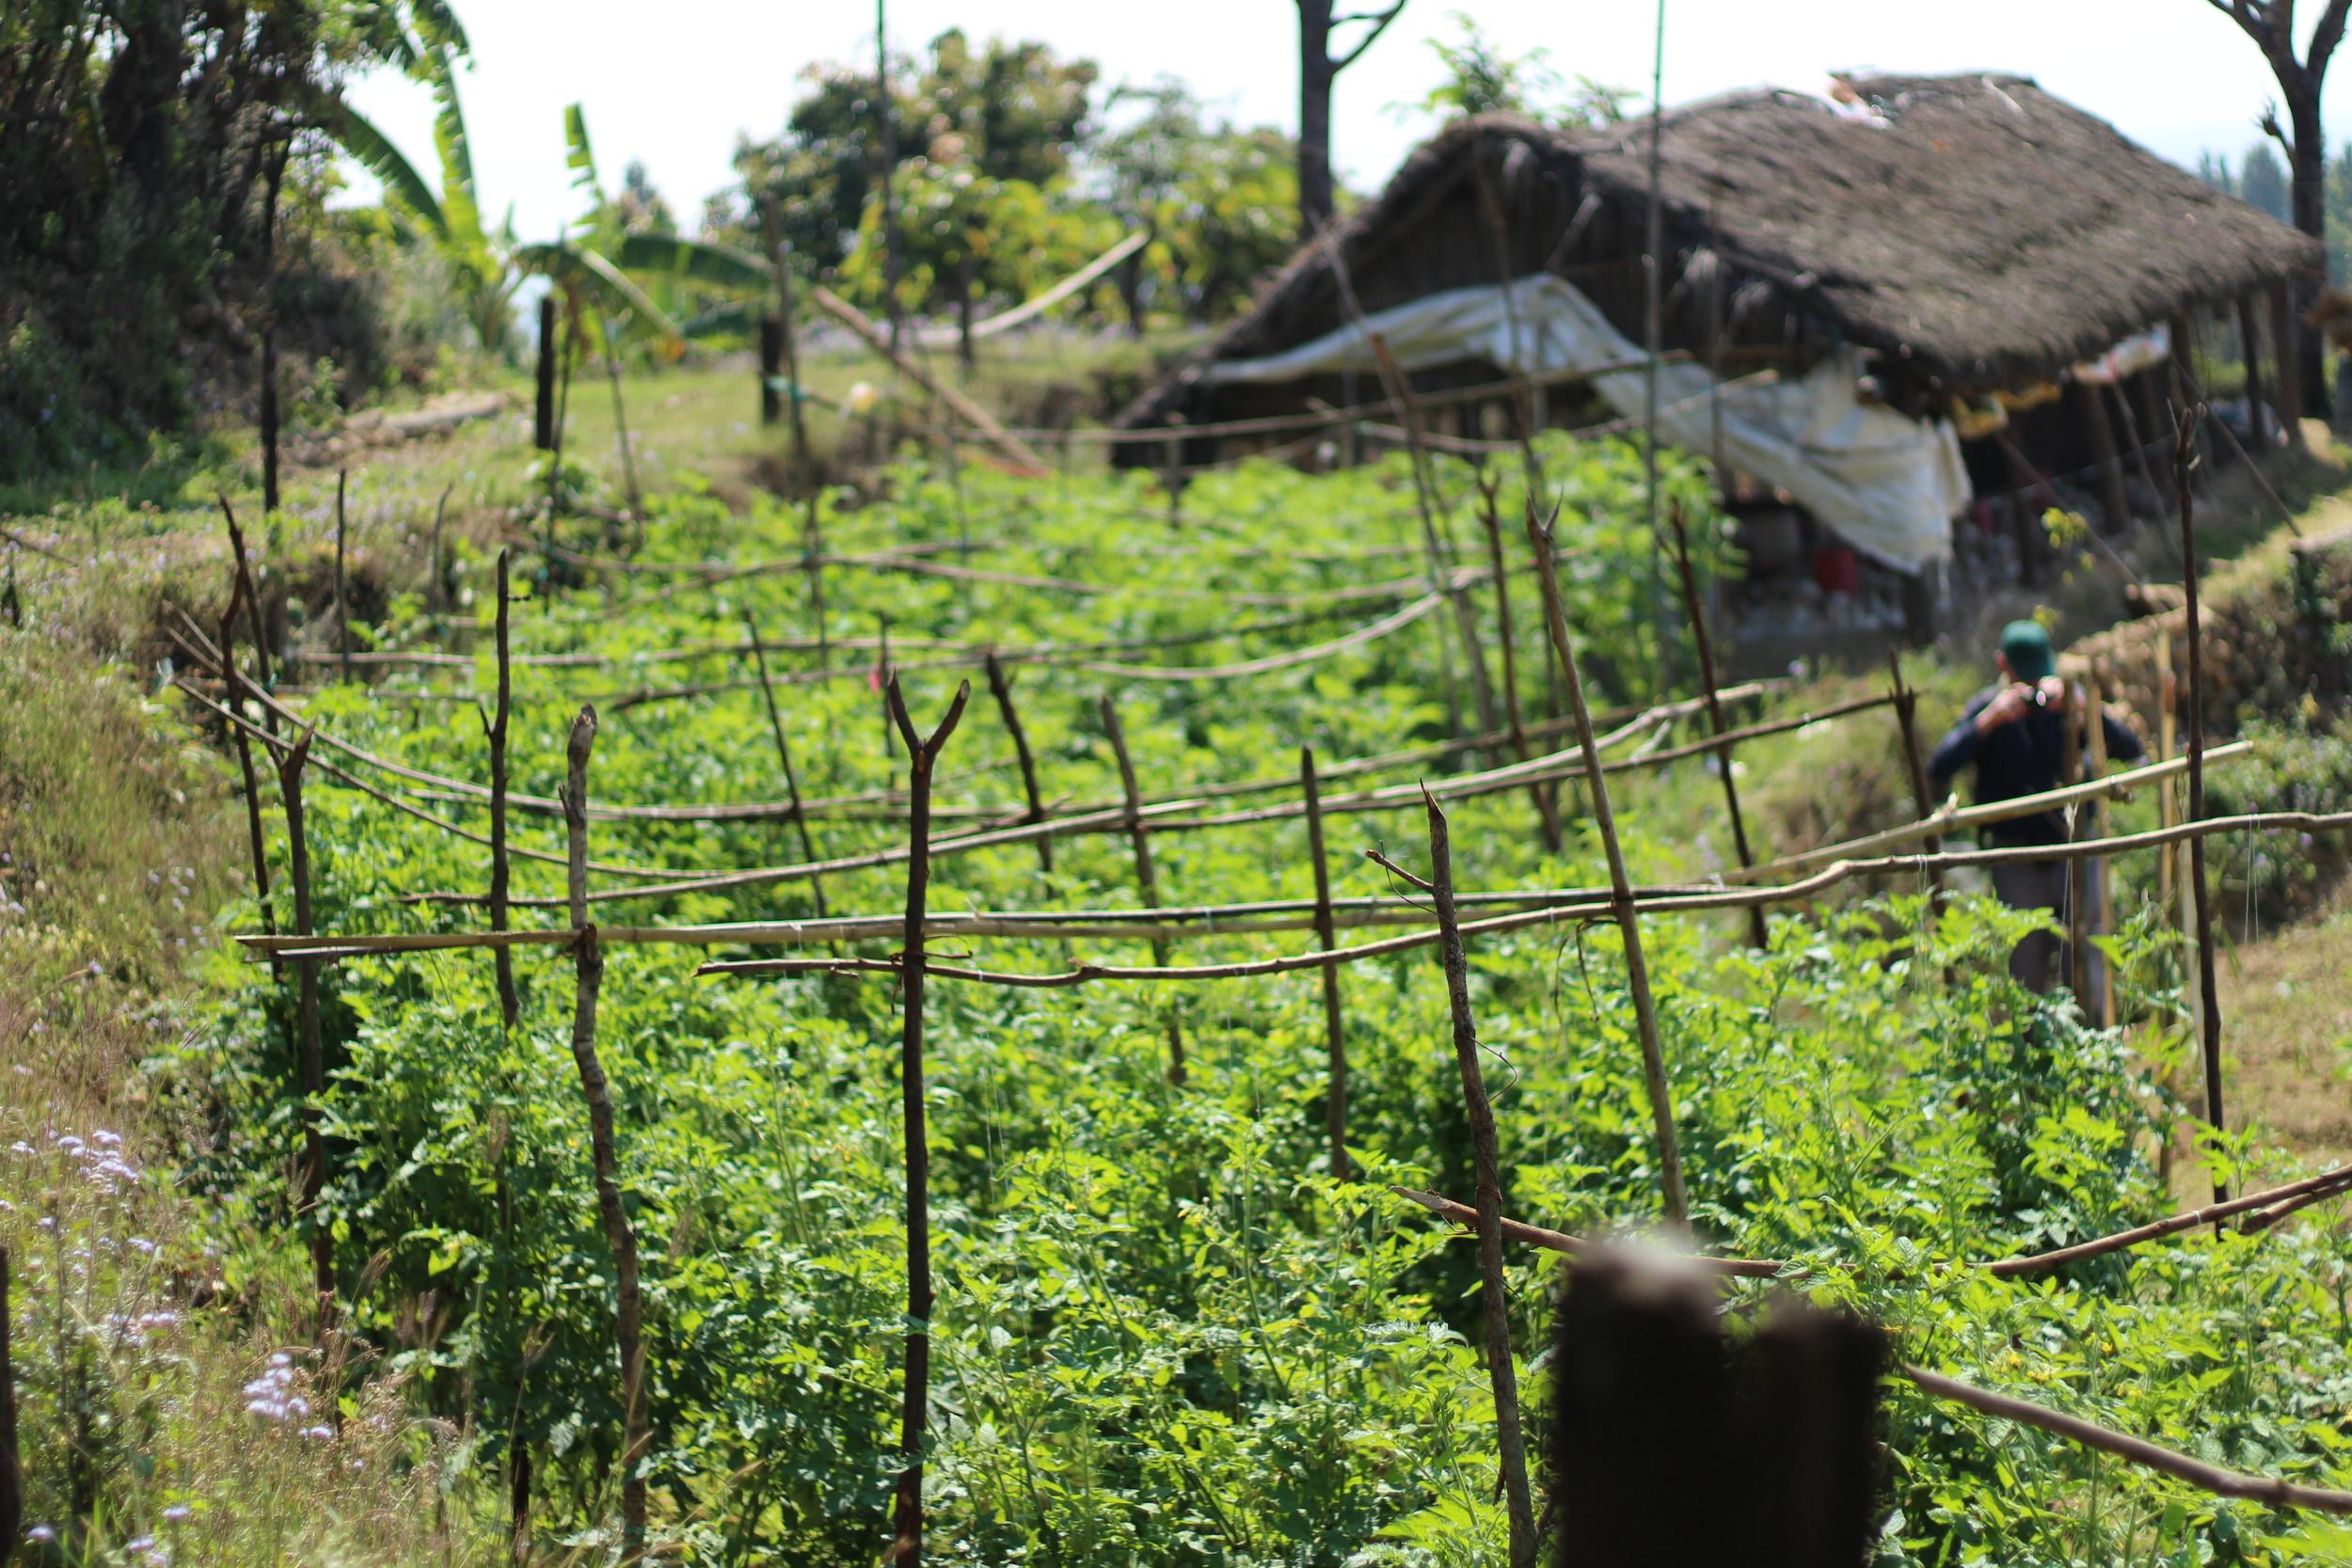 A flourishing tomato crop in Dhabaha VDC